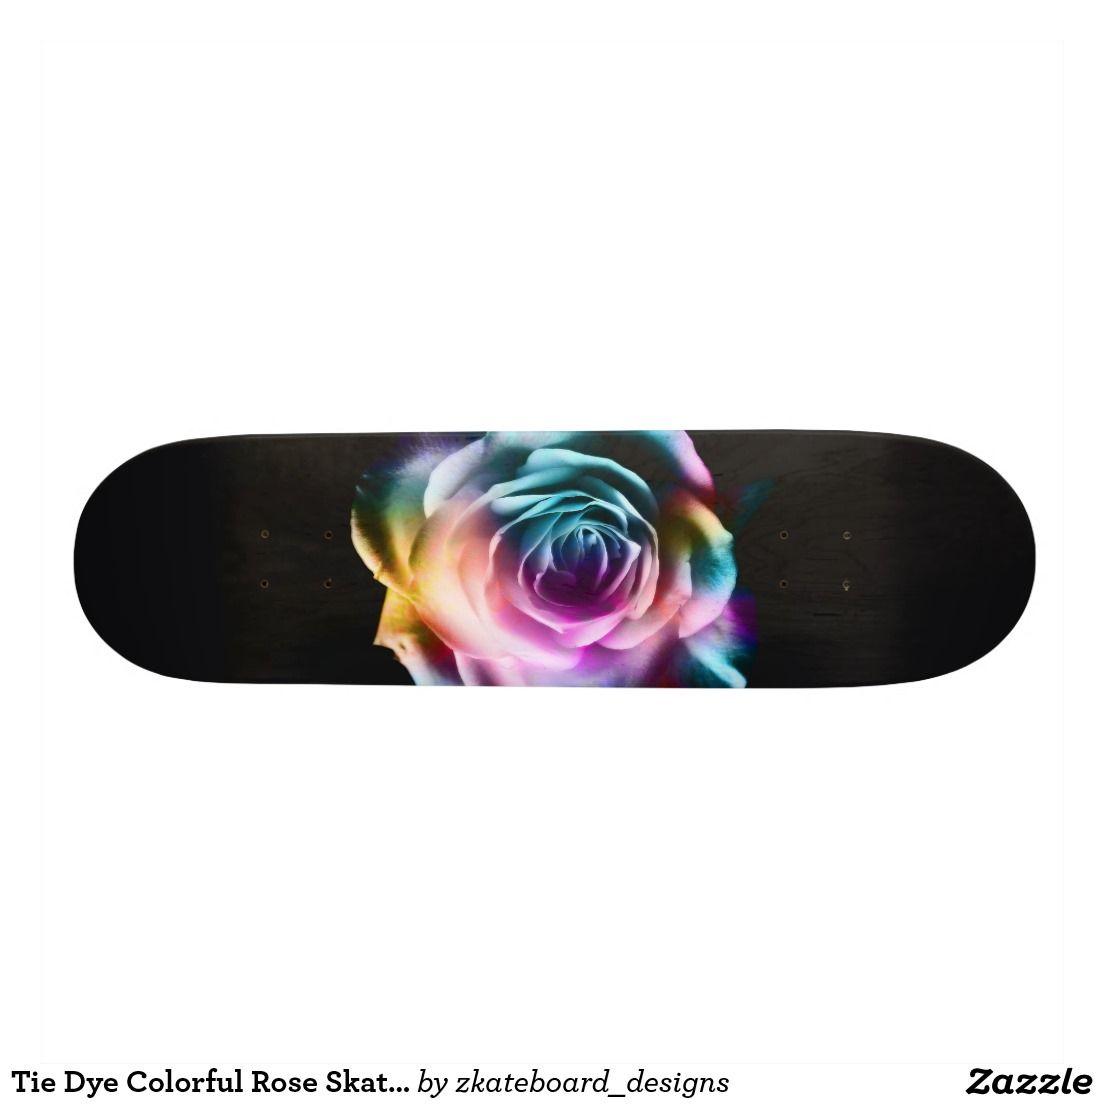 28d3b5ce Tie Dye Colorful Rose Double exposure photography design. Beautiful design  on a skateboard deck. Ride with style ! #skateboard #deck #photography  #design # ...